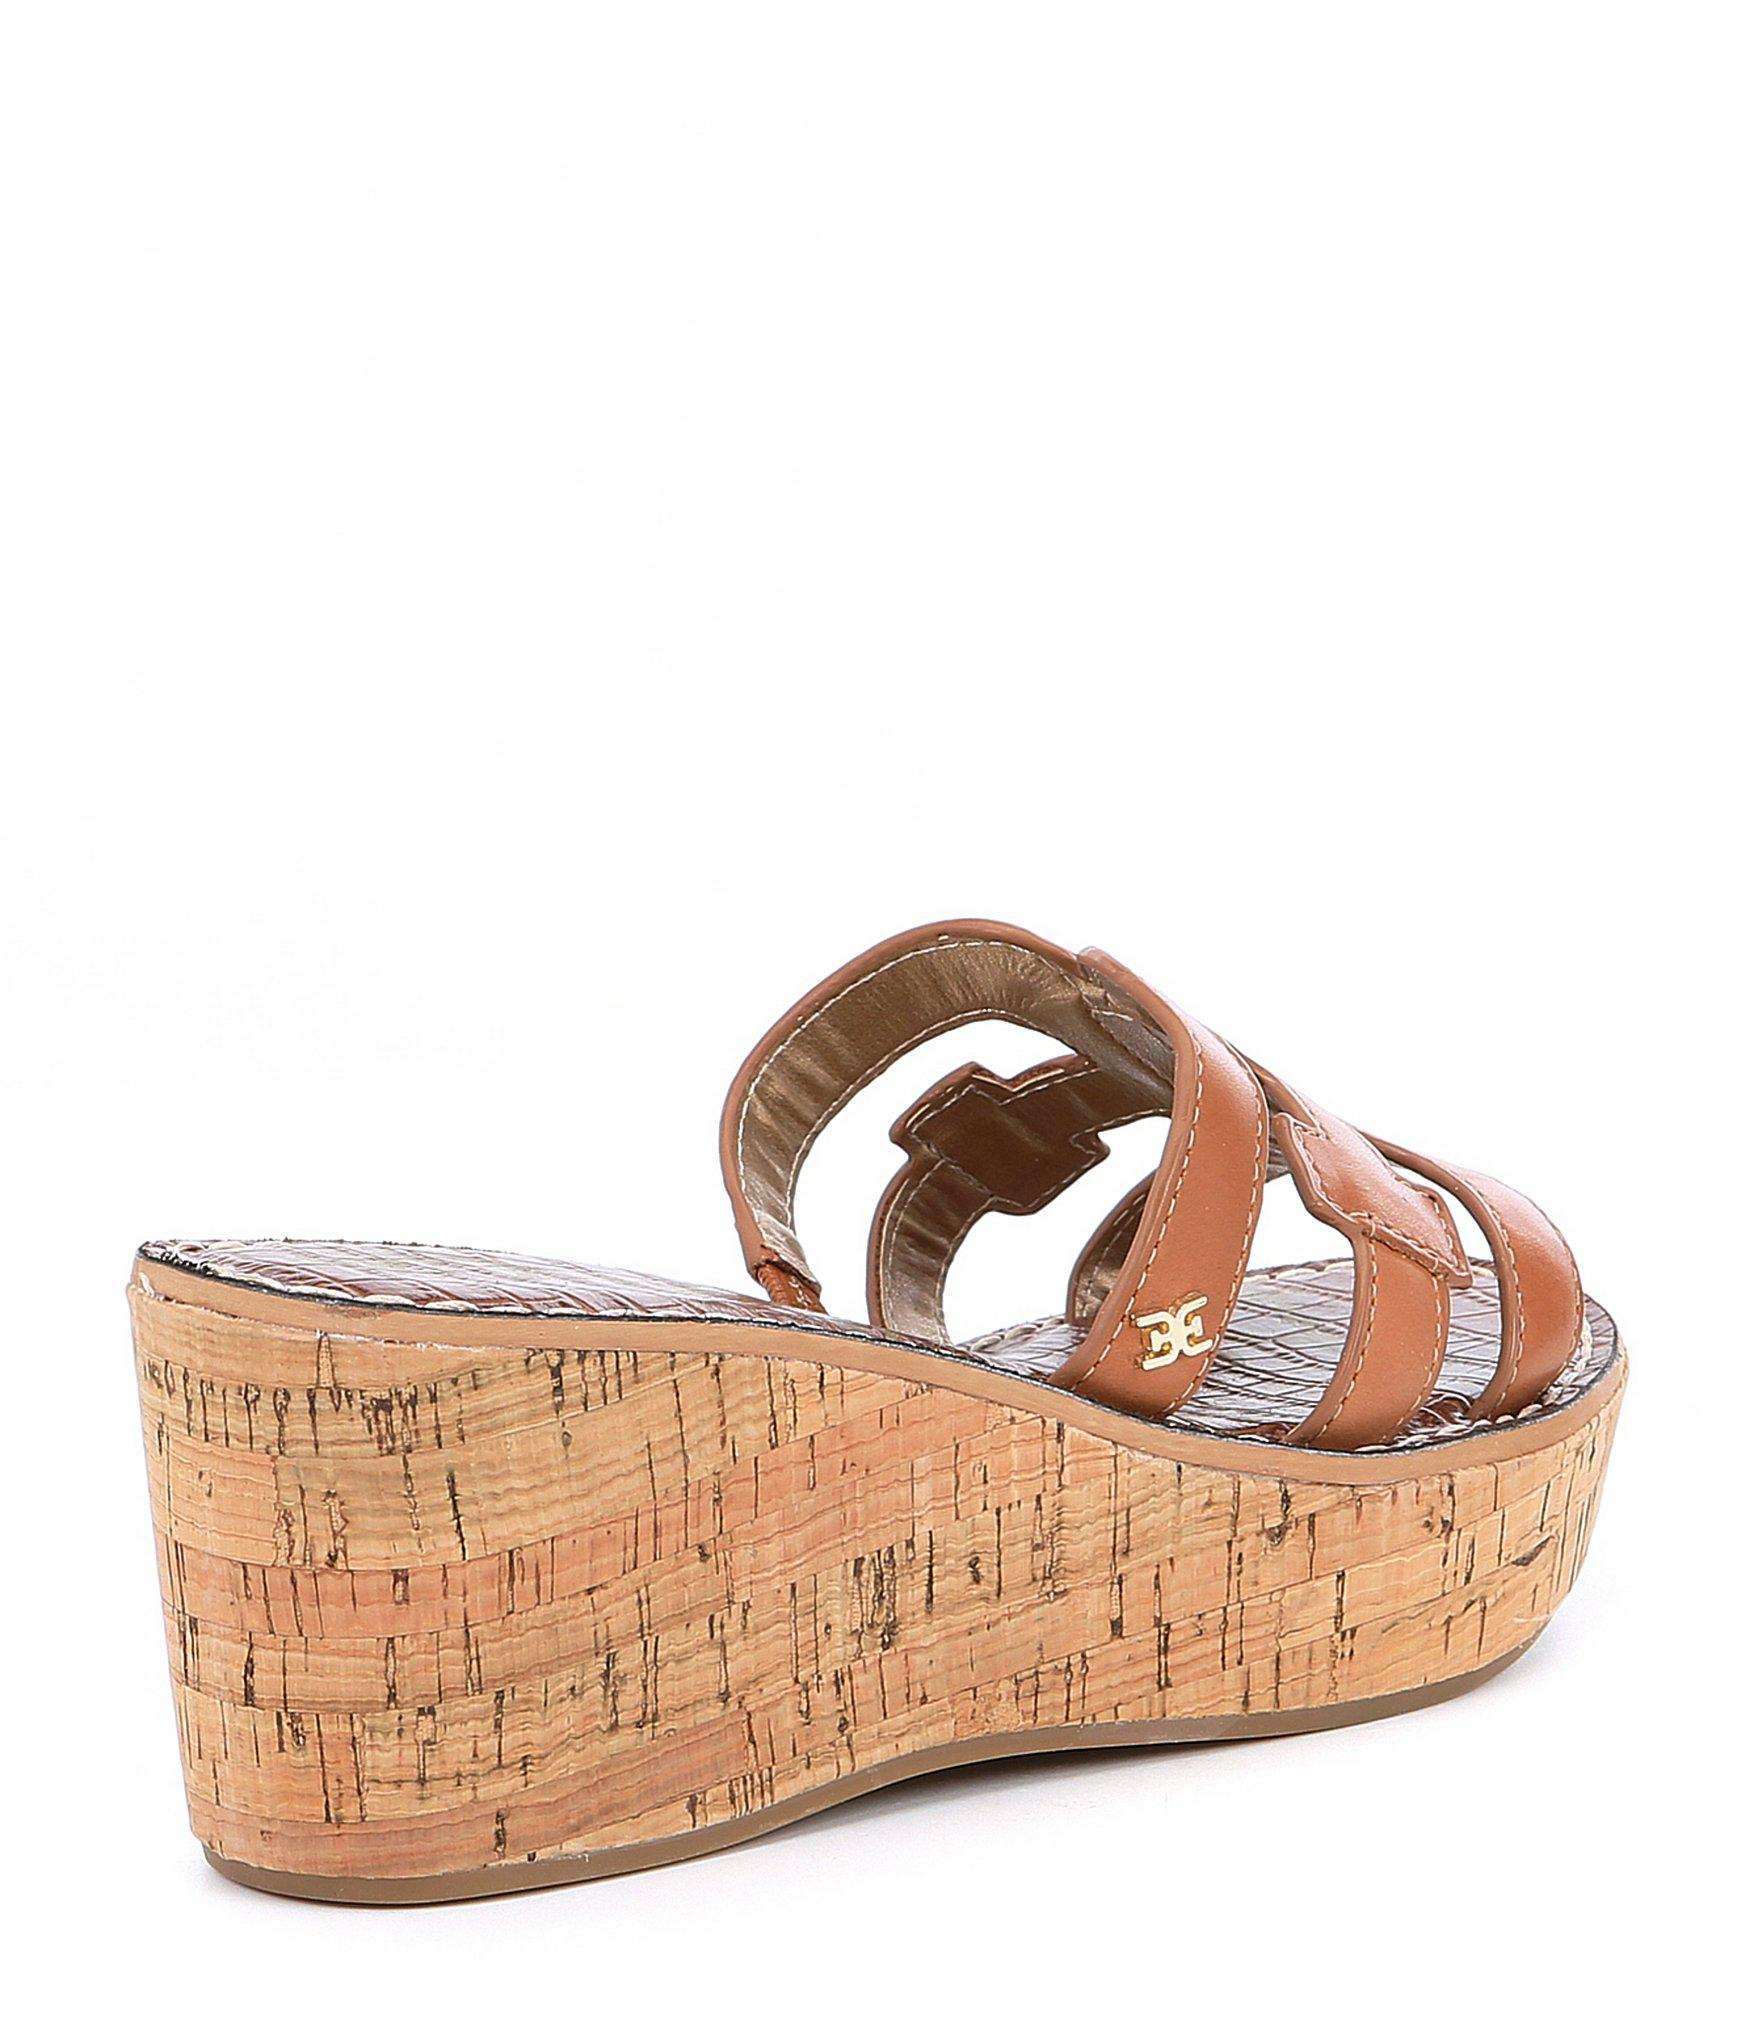 8dadc506fc86f Sam Edelman - Brown Regis Leather Wedge Sandals - Lyst. View fullscreen